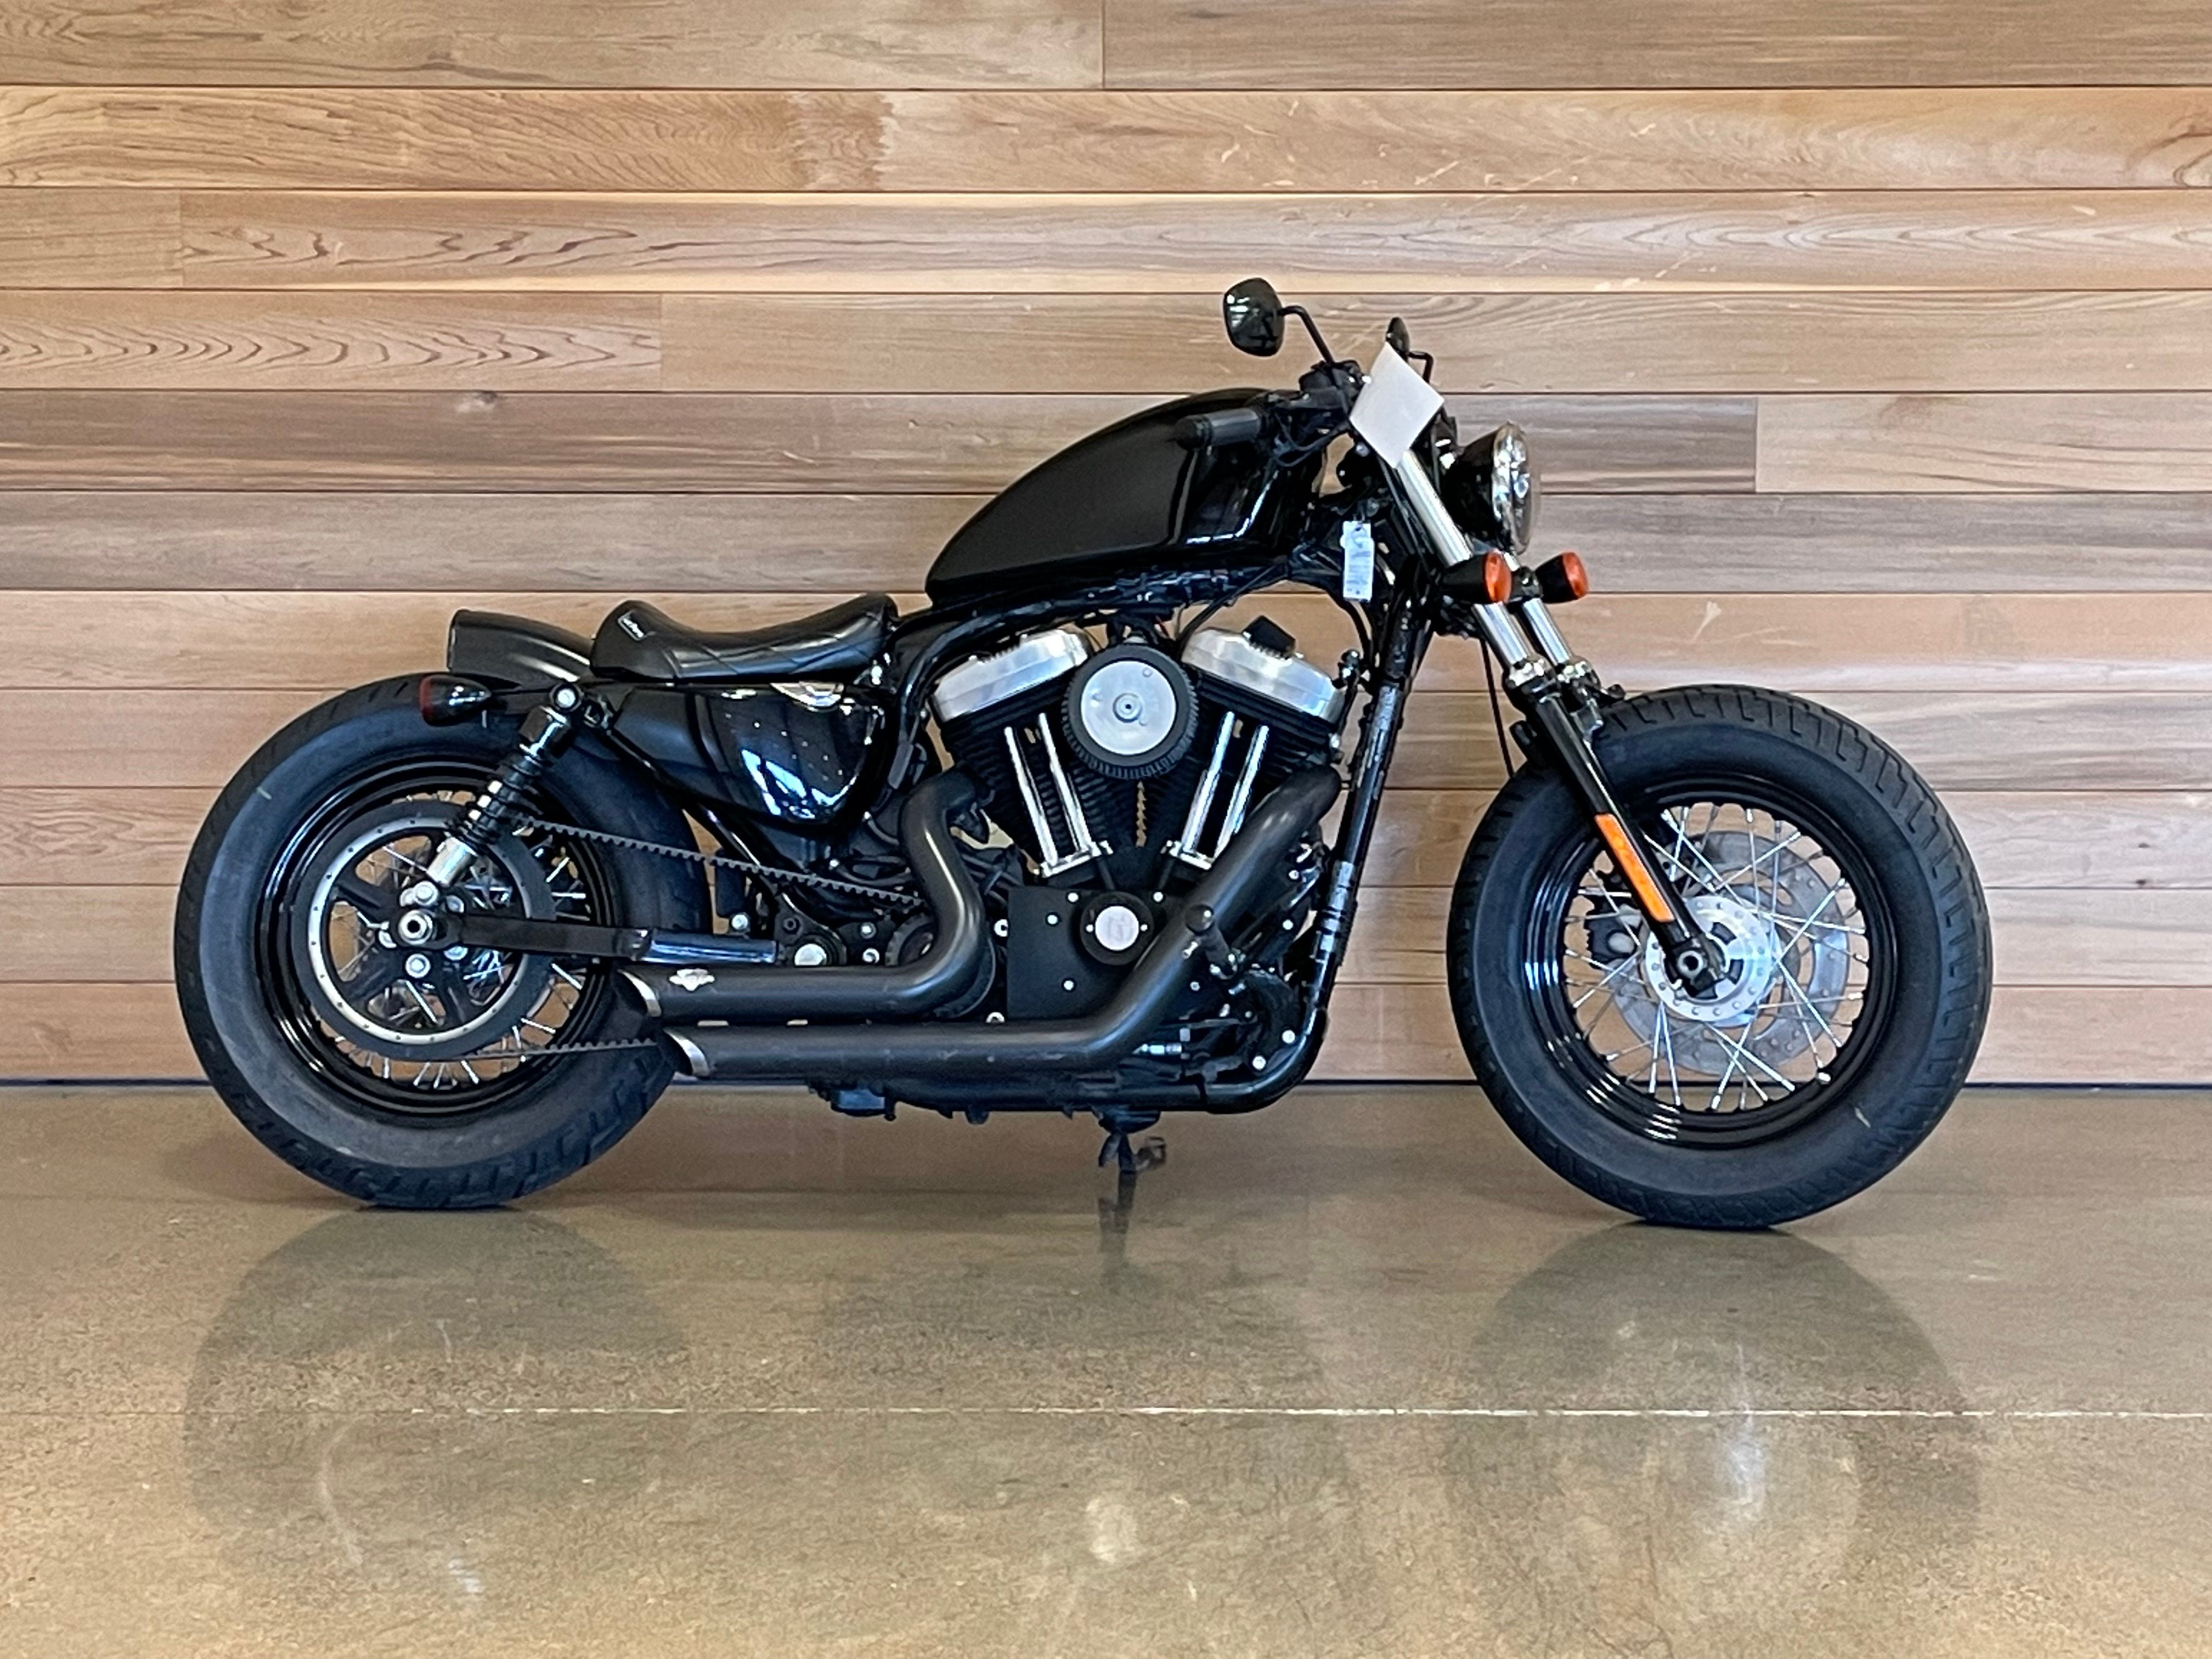 2011 Harley-Davidson Forty-Eight